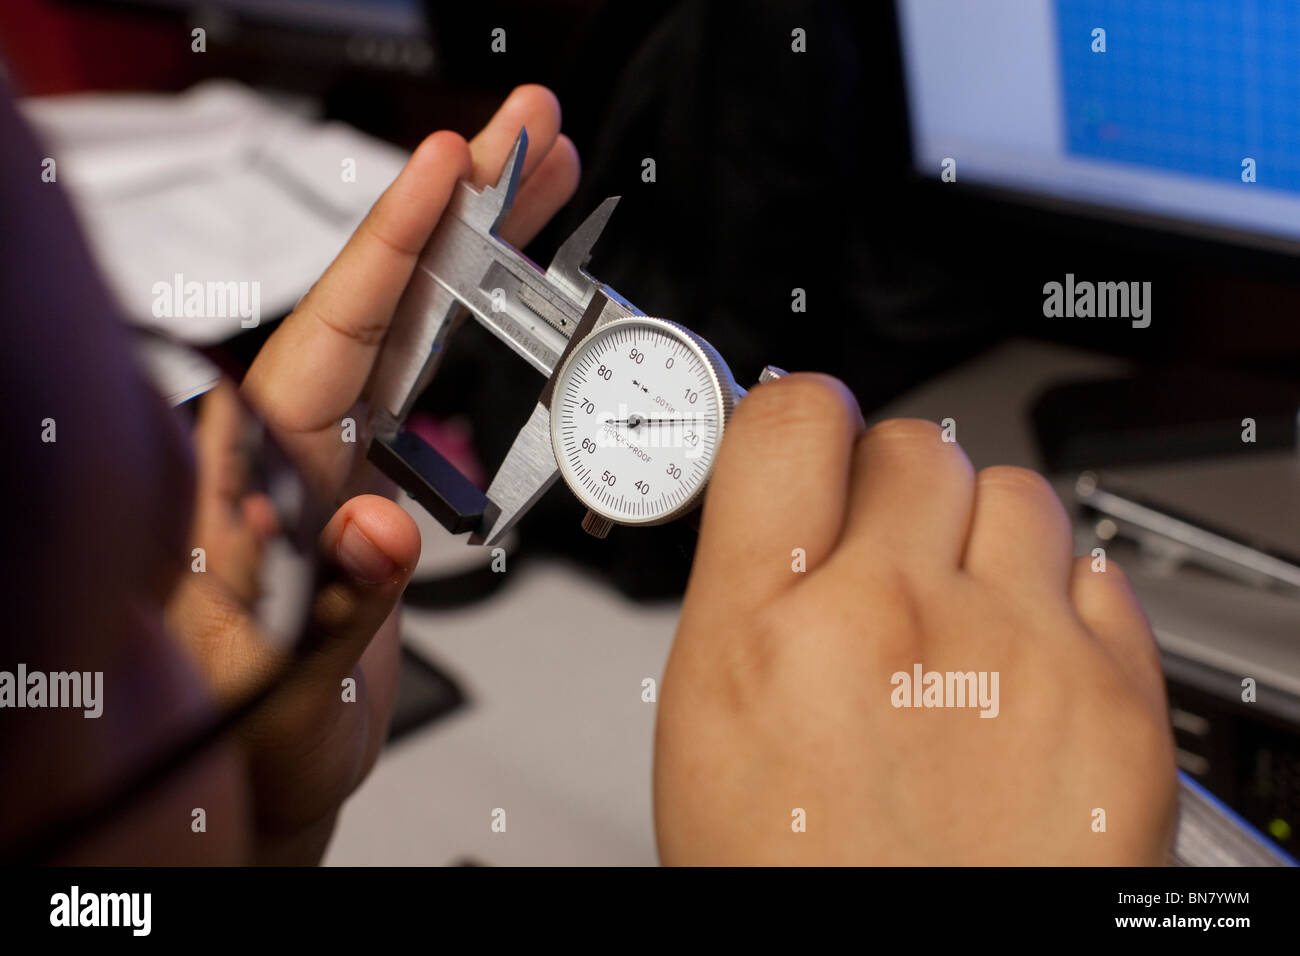 High school boy uses a caliper to take a measurement in freshman engineering class Stock Photo